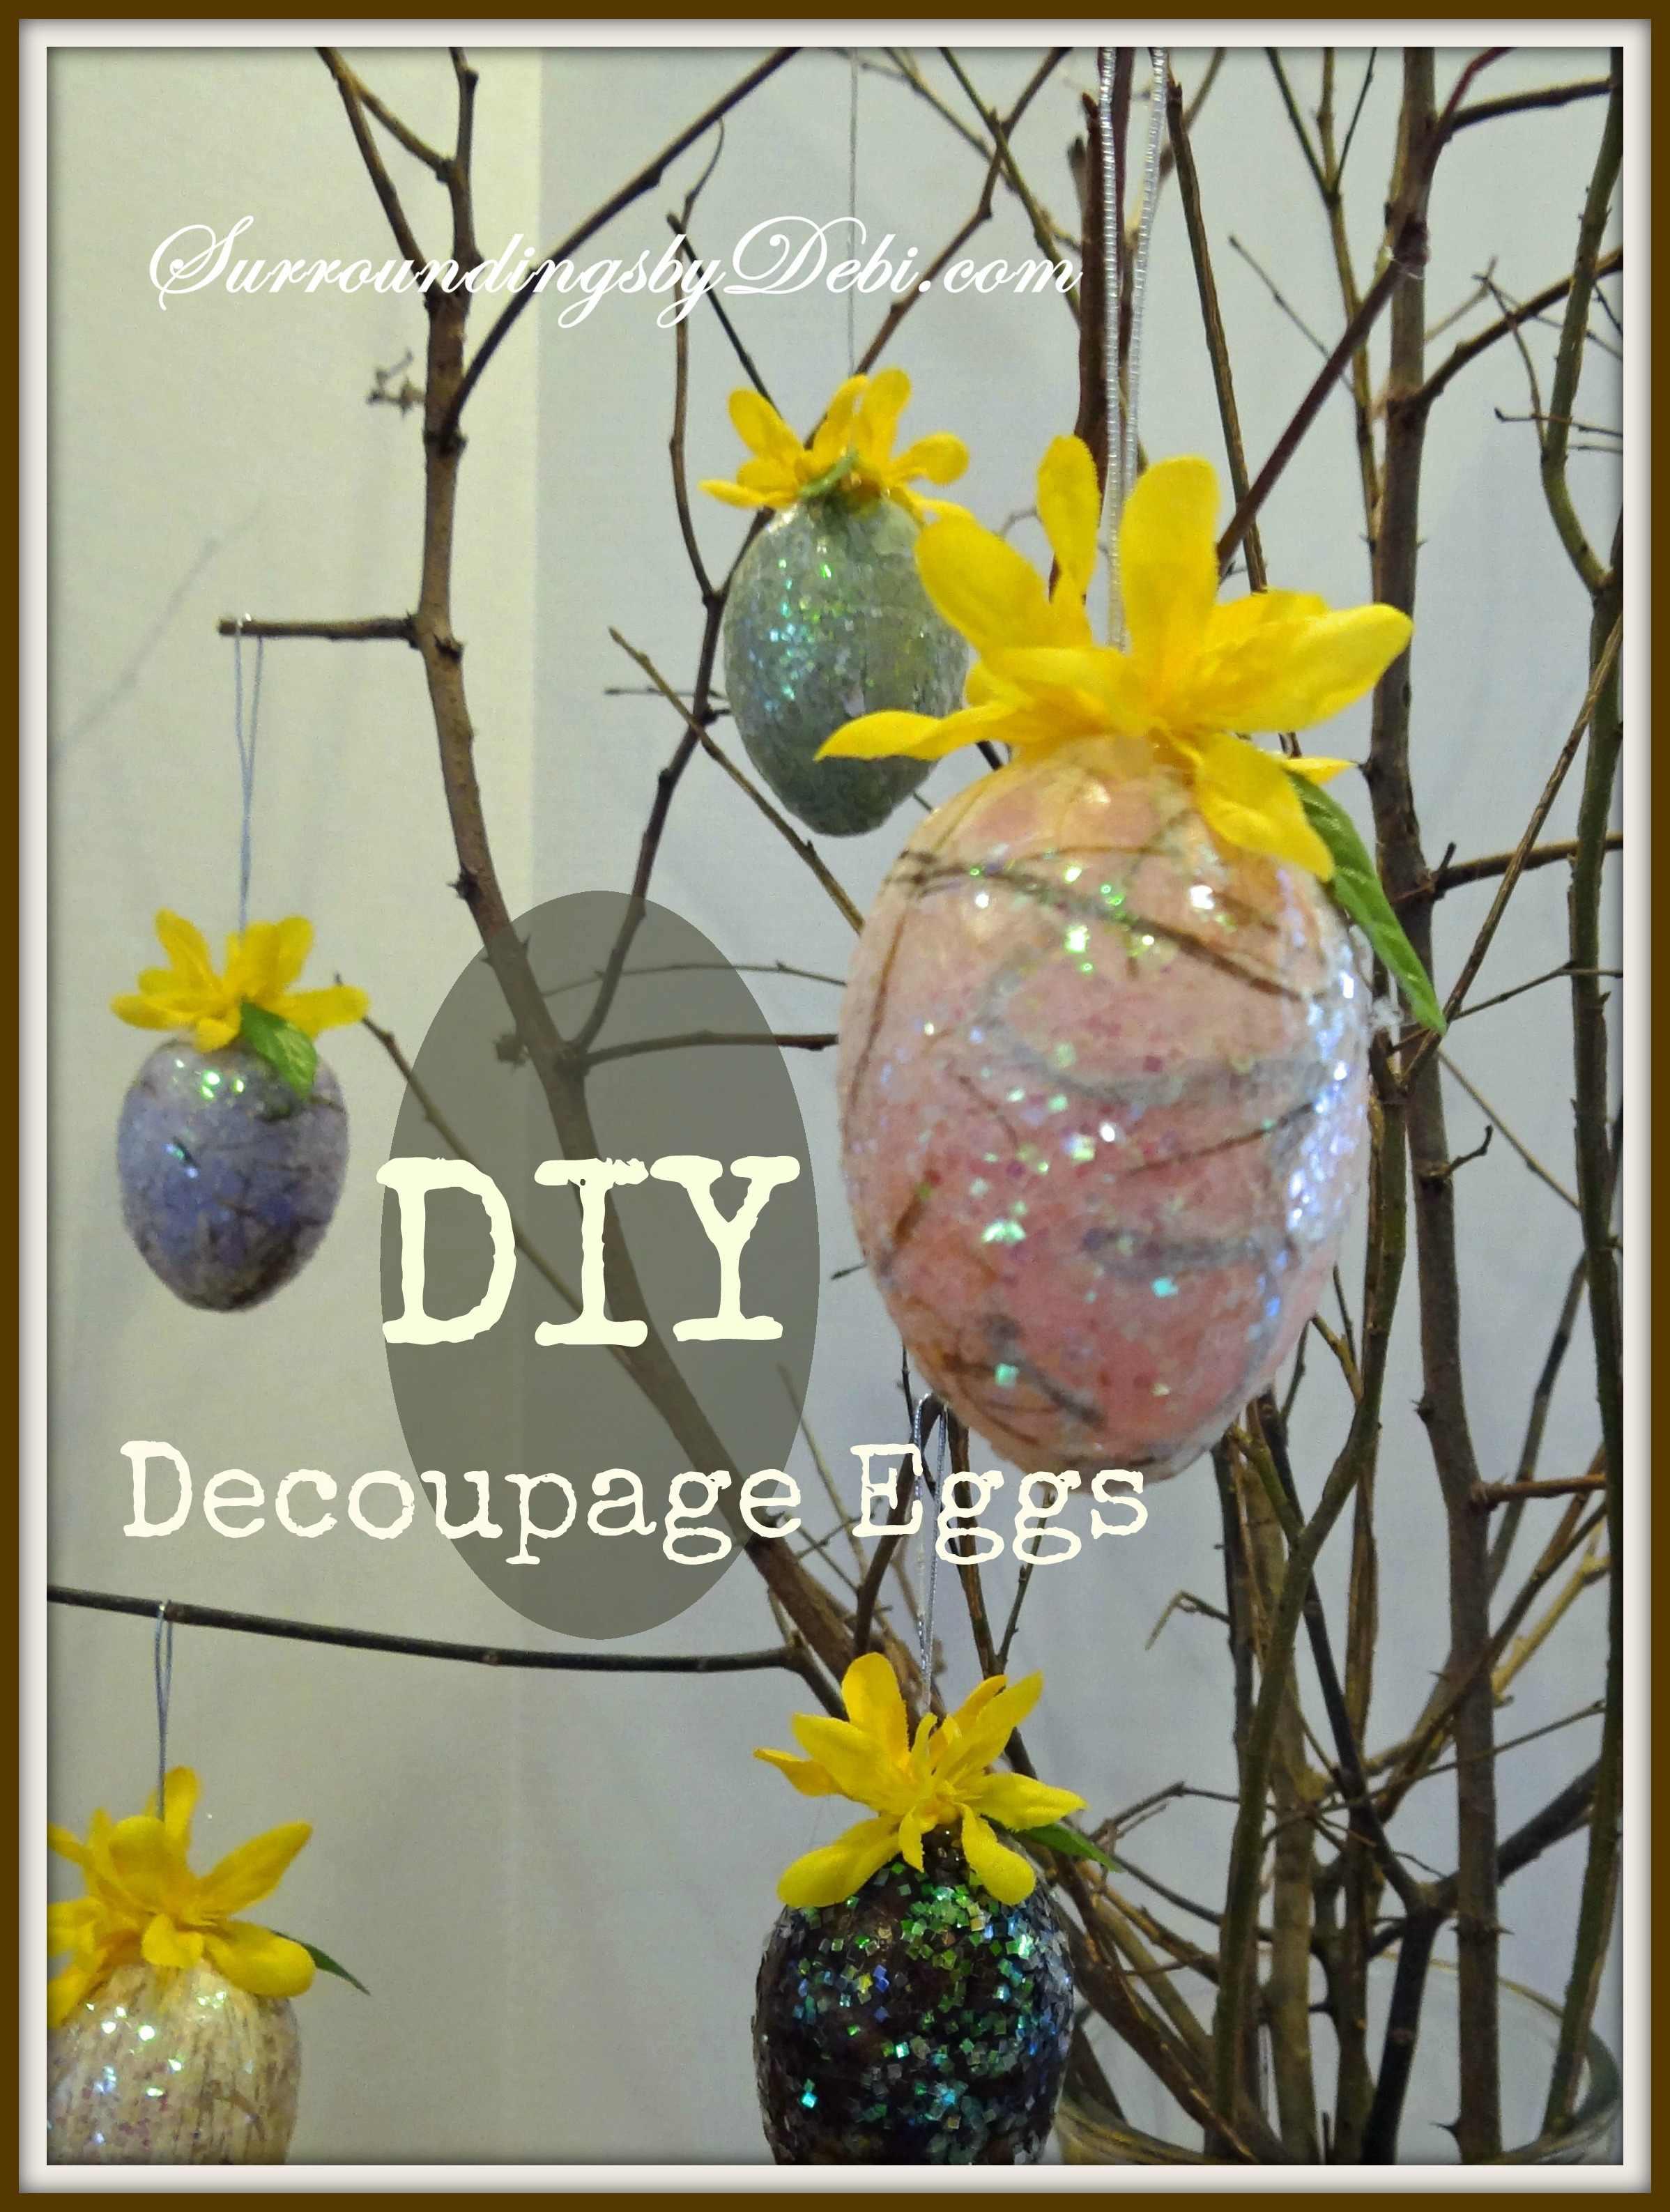 DIY Hanging Egg Ornaments